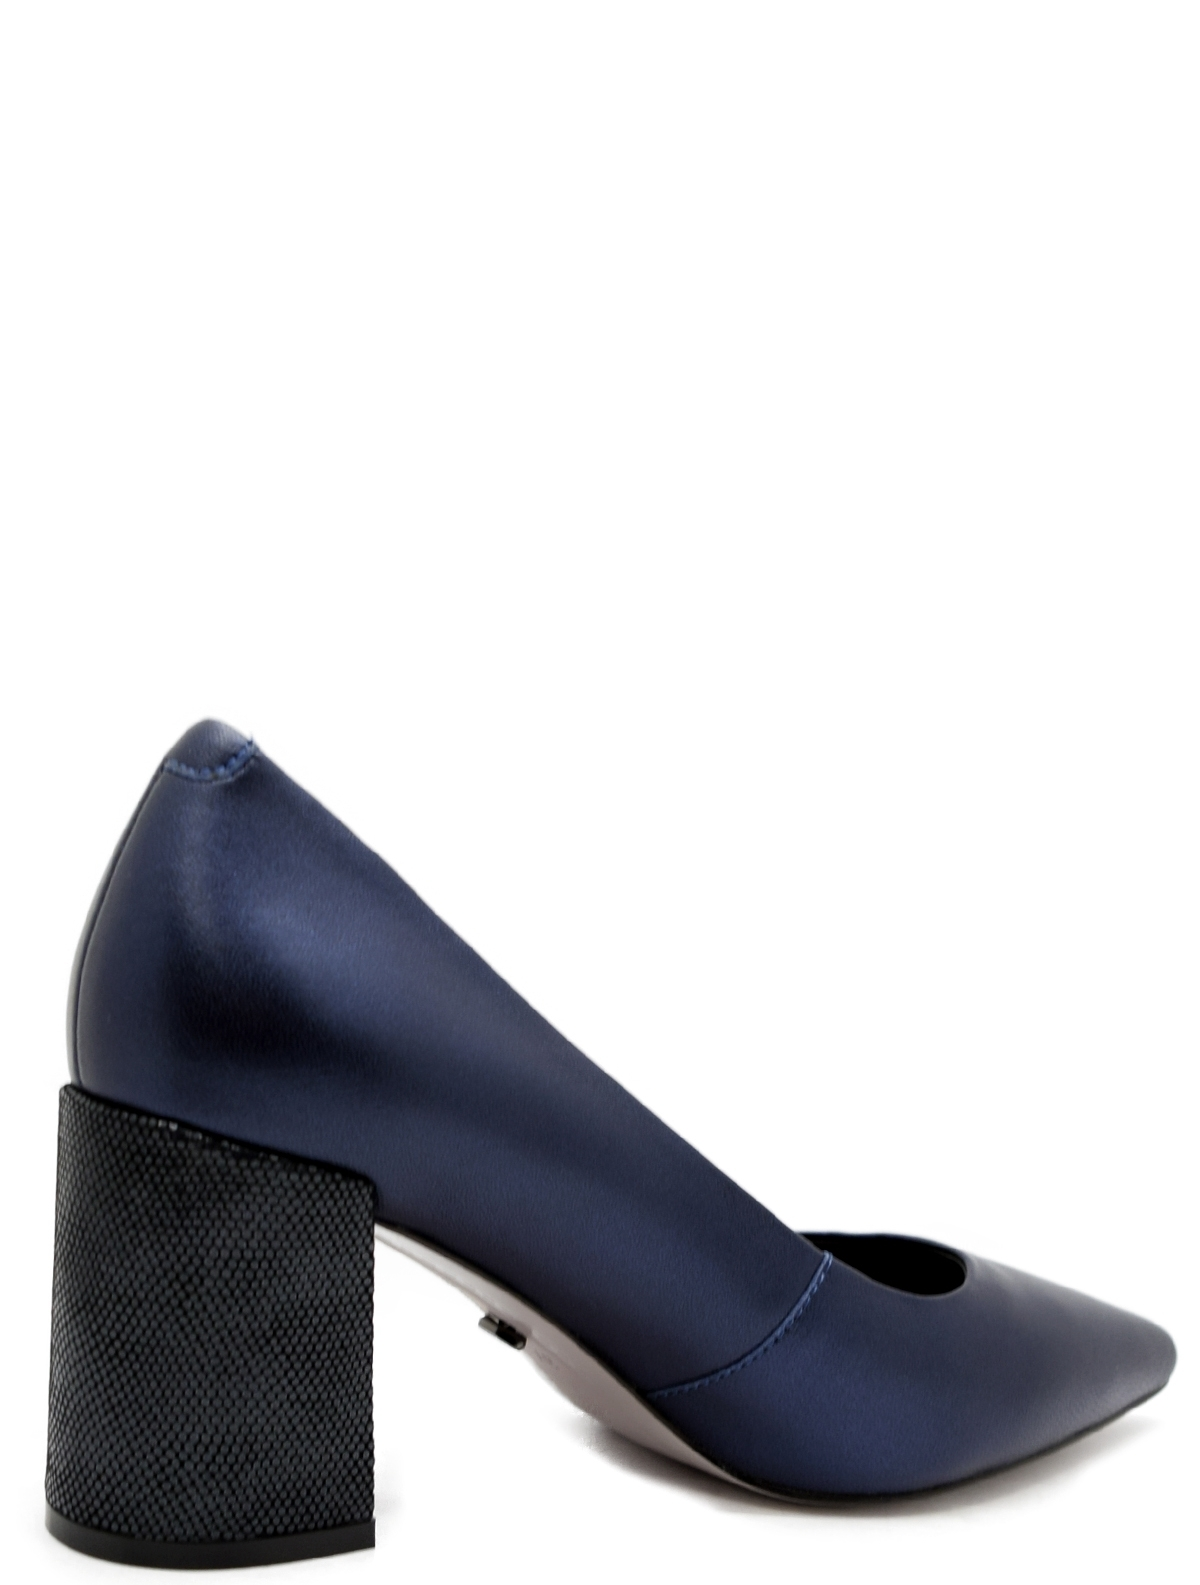 GRACIANA W2225-C06-12 женские туфли